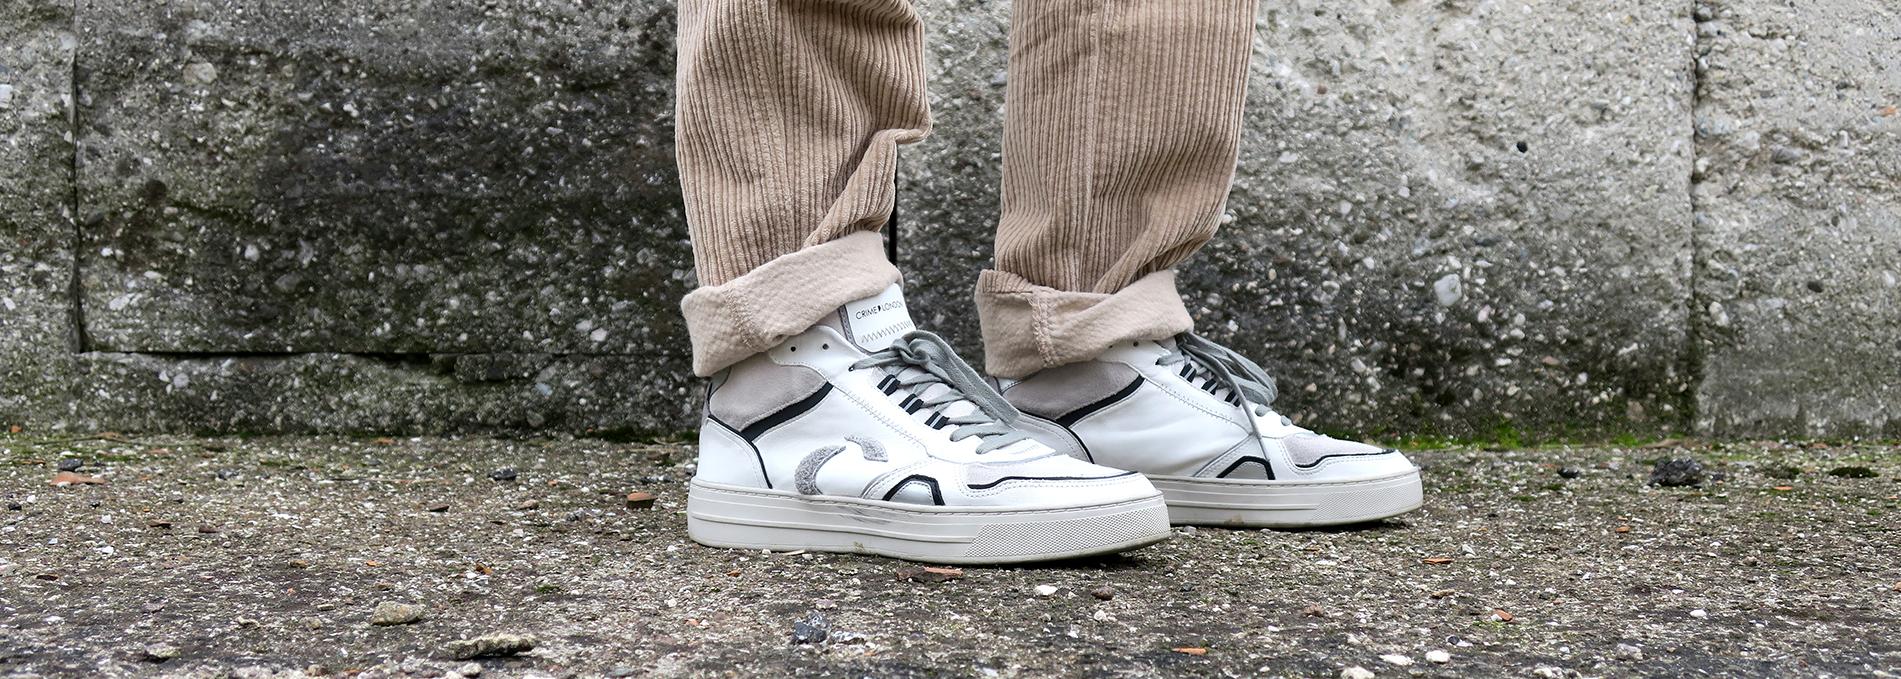 Sneakers-moda-2020-come-indossarle